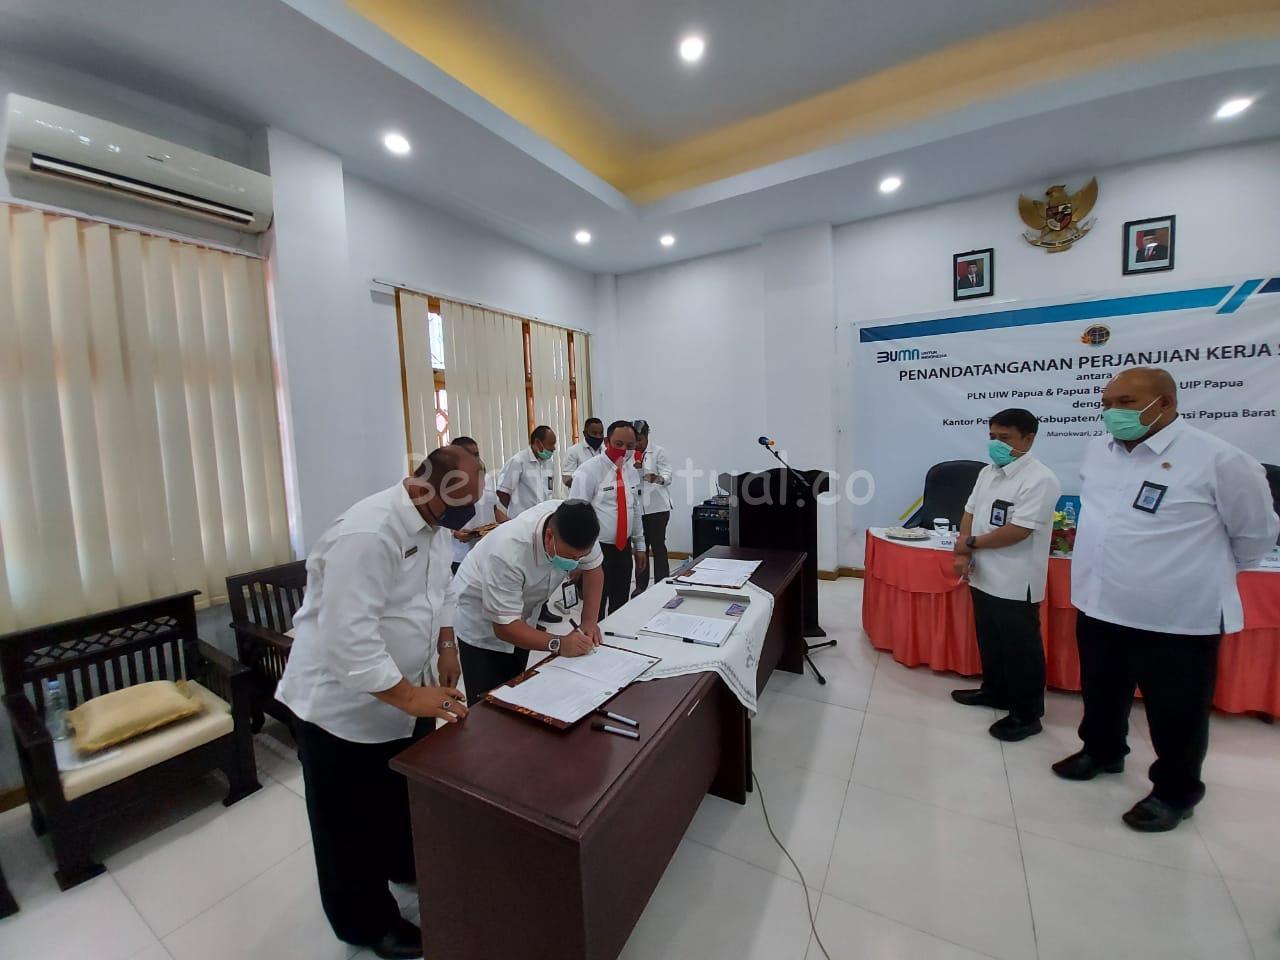 PLN Unit Papua Dan Papua Barat Teken MoU Bersama BPN Untuk Sertifikasi Tanah 1 IMG 20200722 WA0087